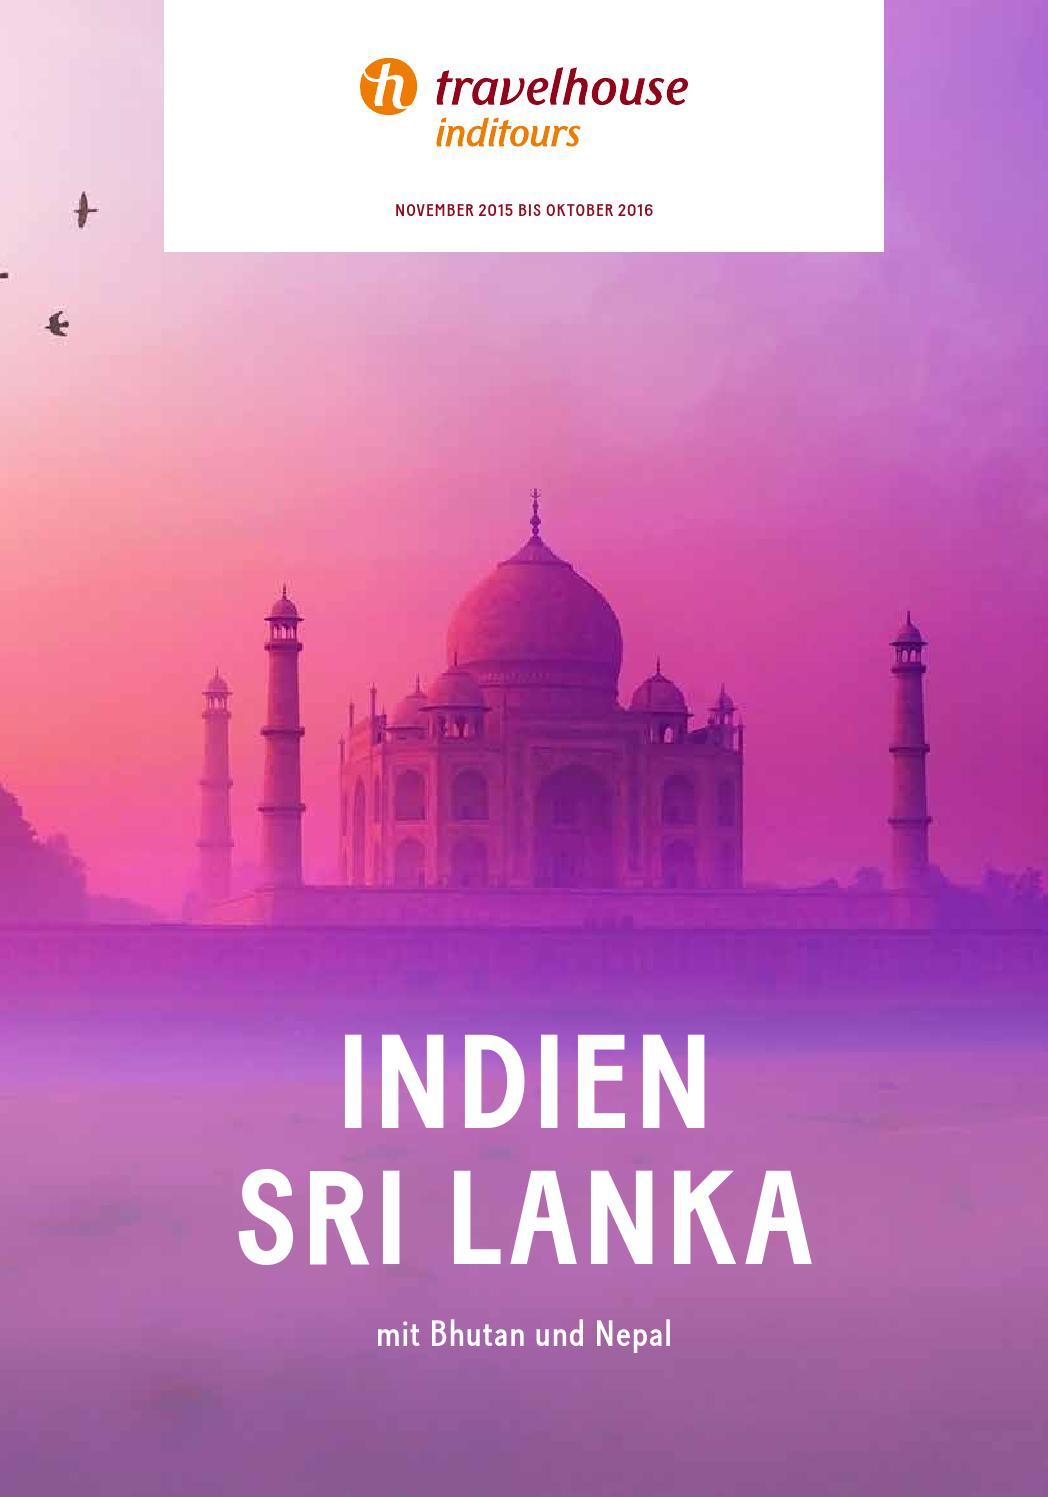 Travelhouse Indien, Sri Lanka - November 2015 bis Oktober 2016 by ...